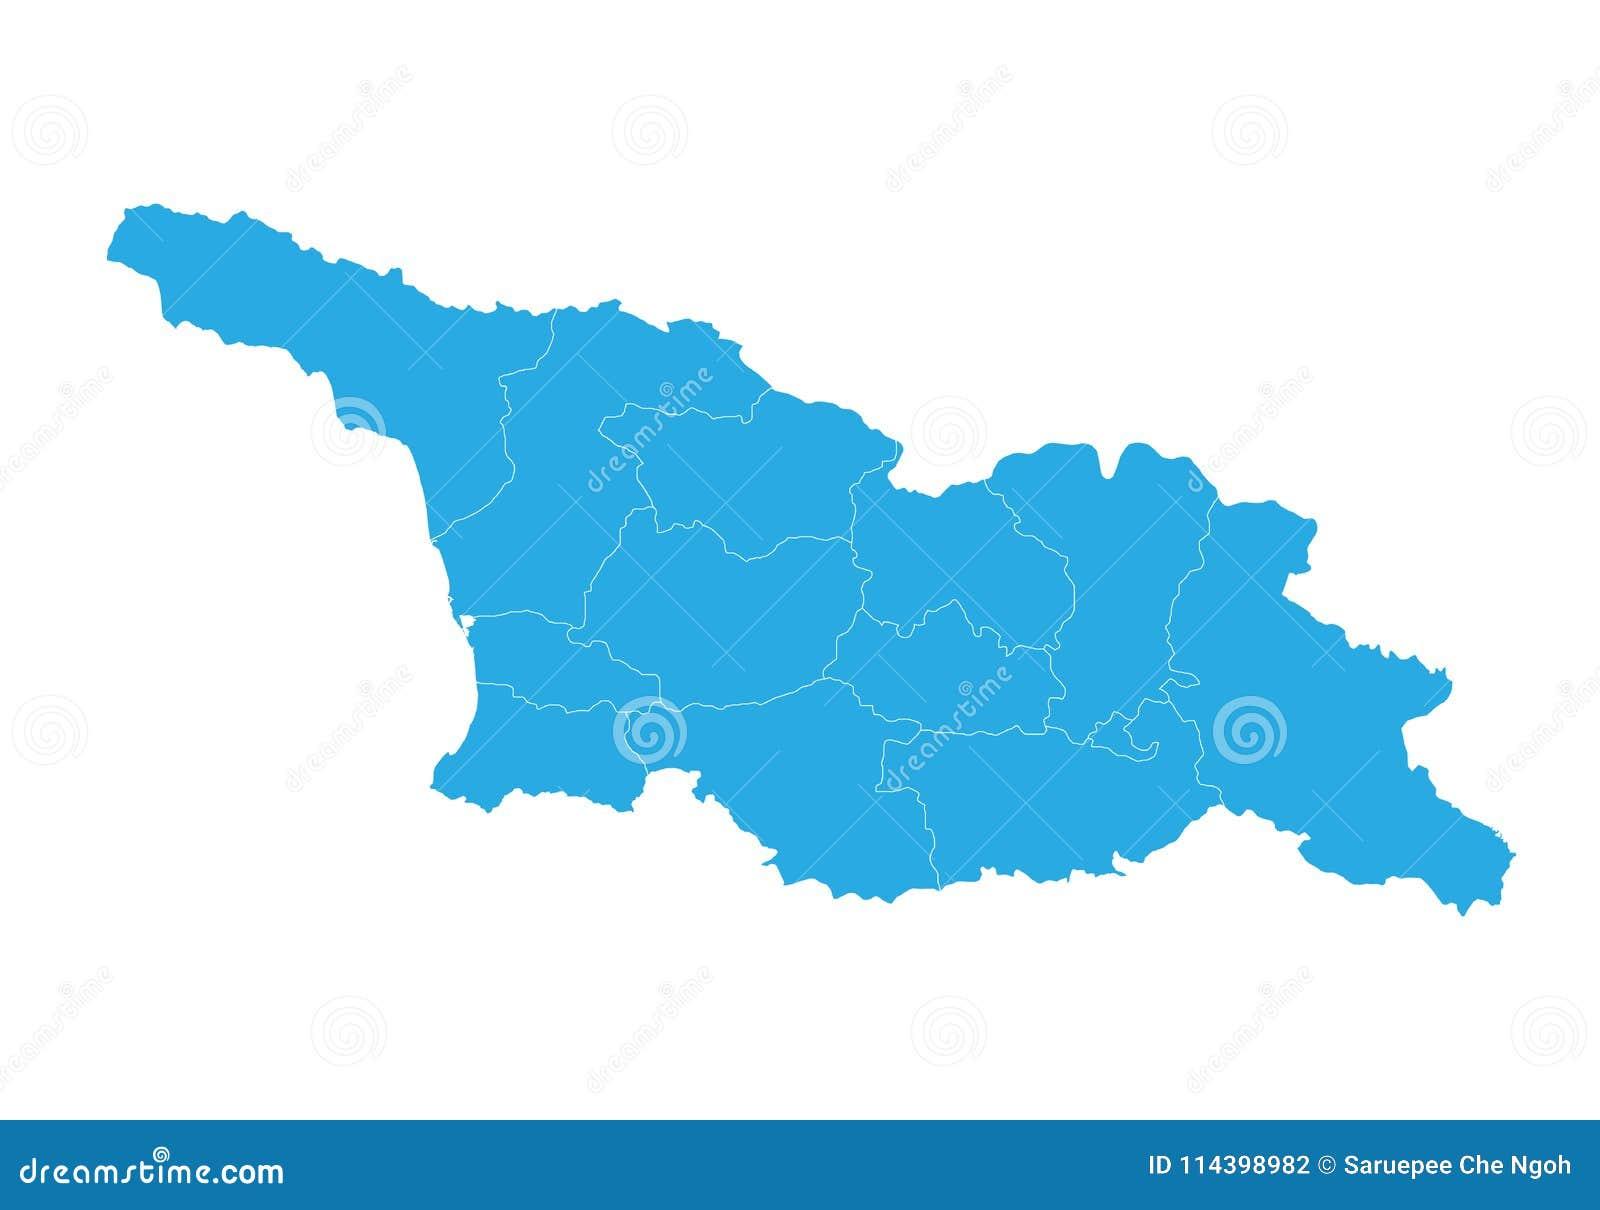 Georgia Del Sur Mapa.Mapa De Georgia Osetia Del Sur Alto Mapa Detallado Del